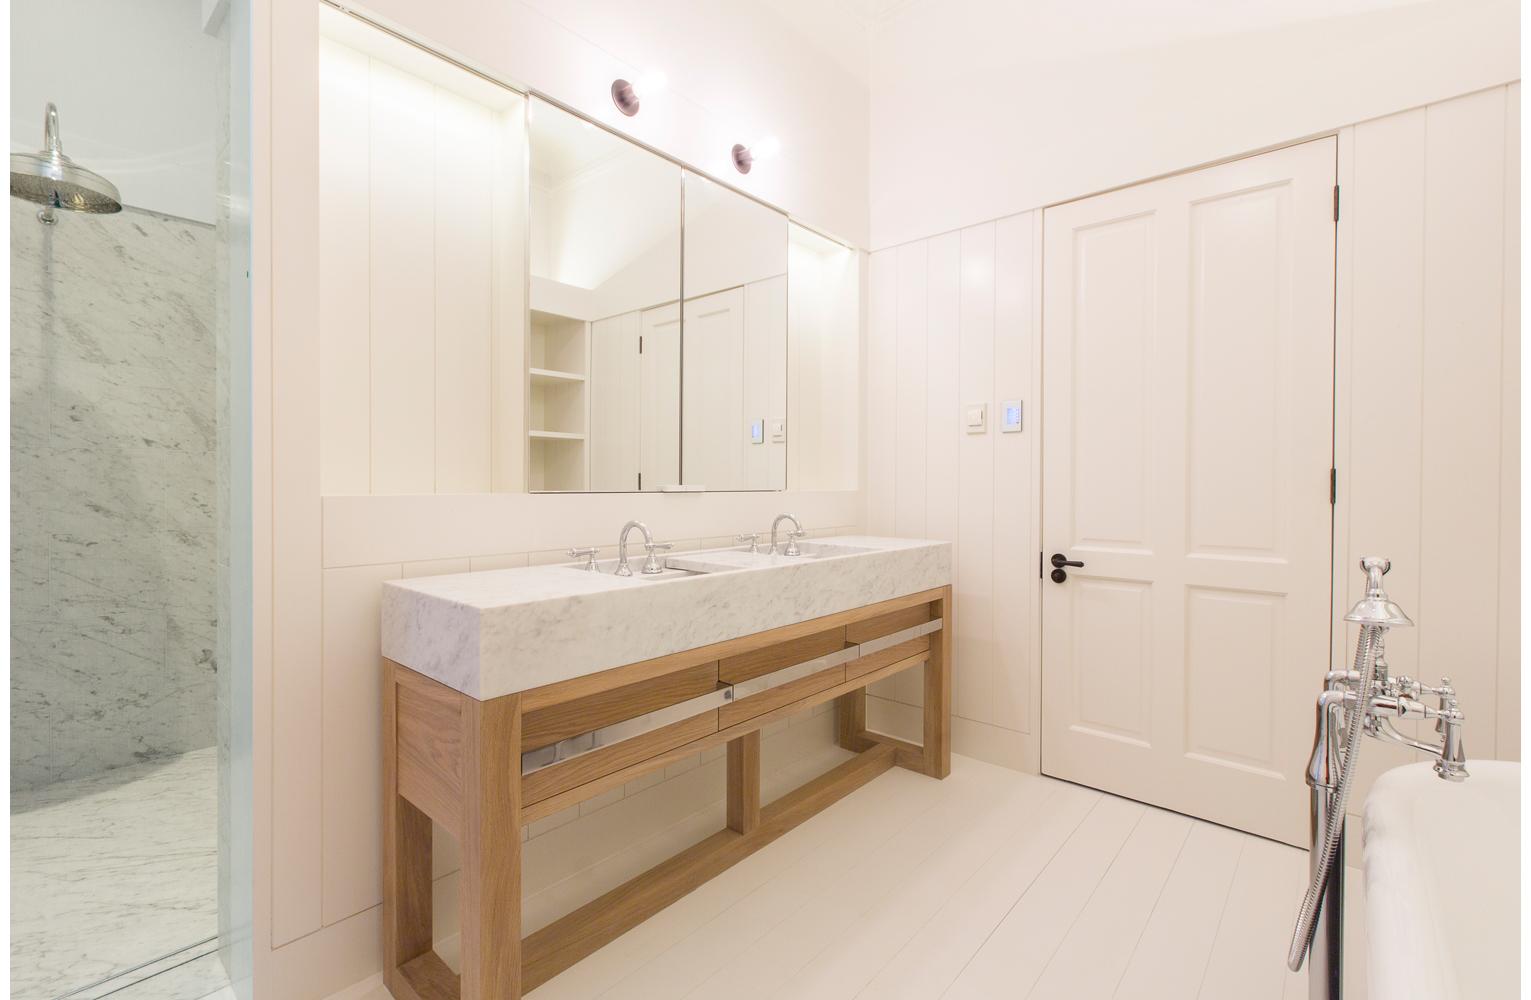 maek-luxury-home-design-inspiration-toodyay-bathroom-gallery-12.jpg